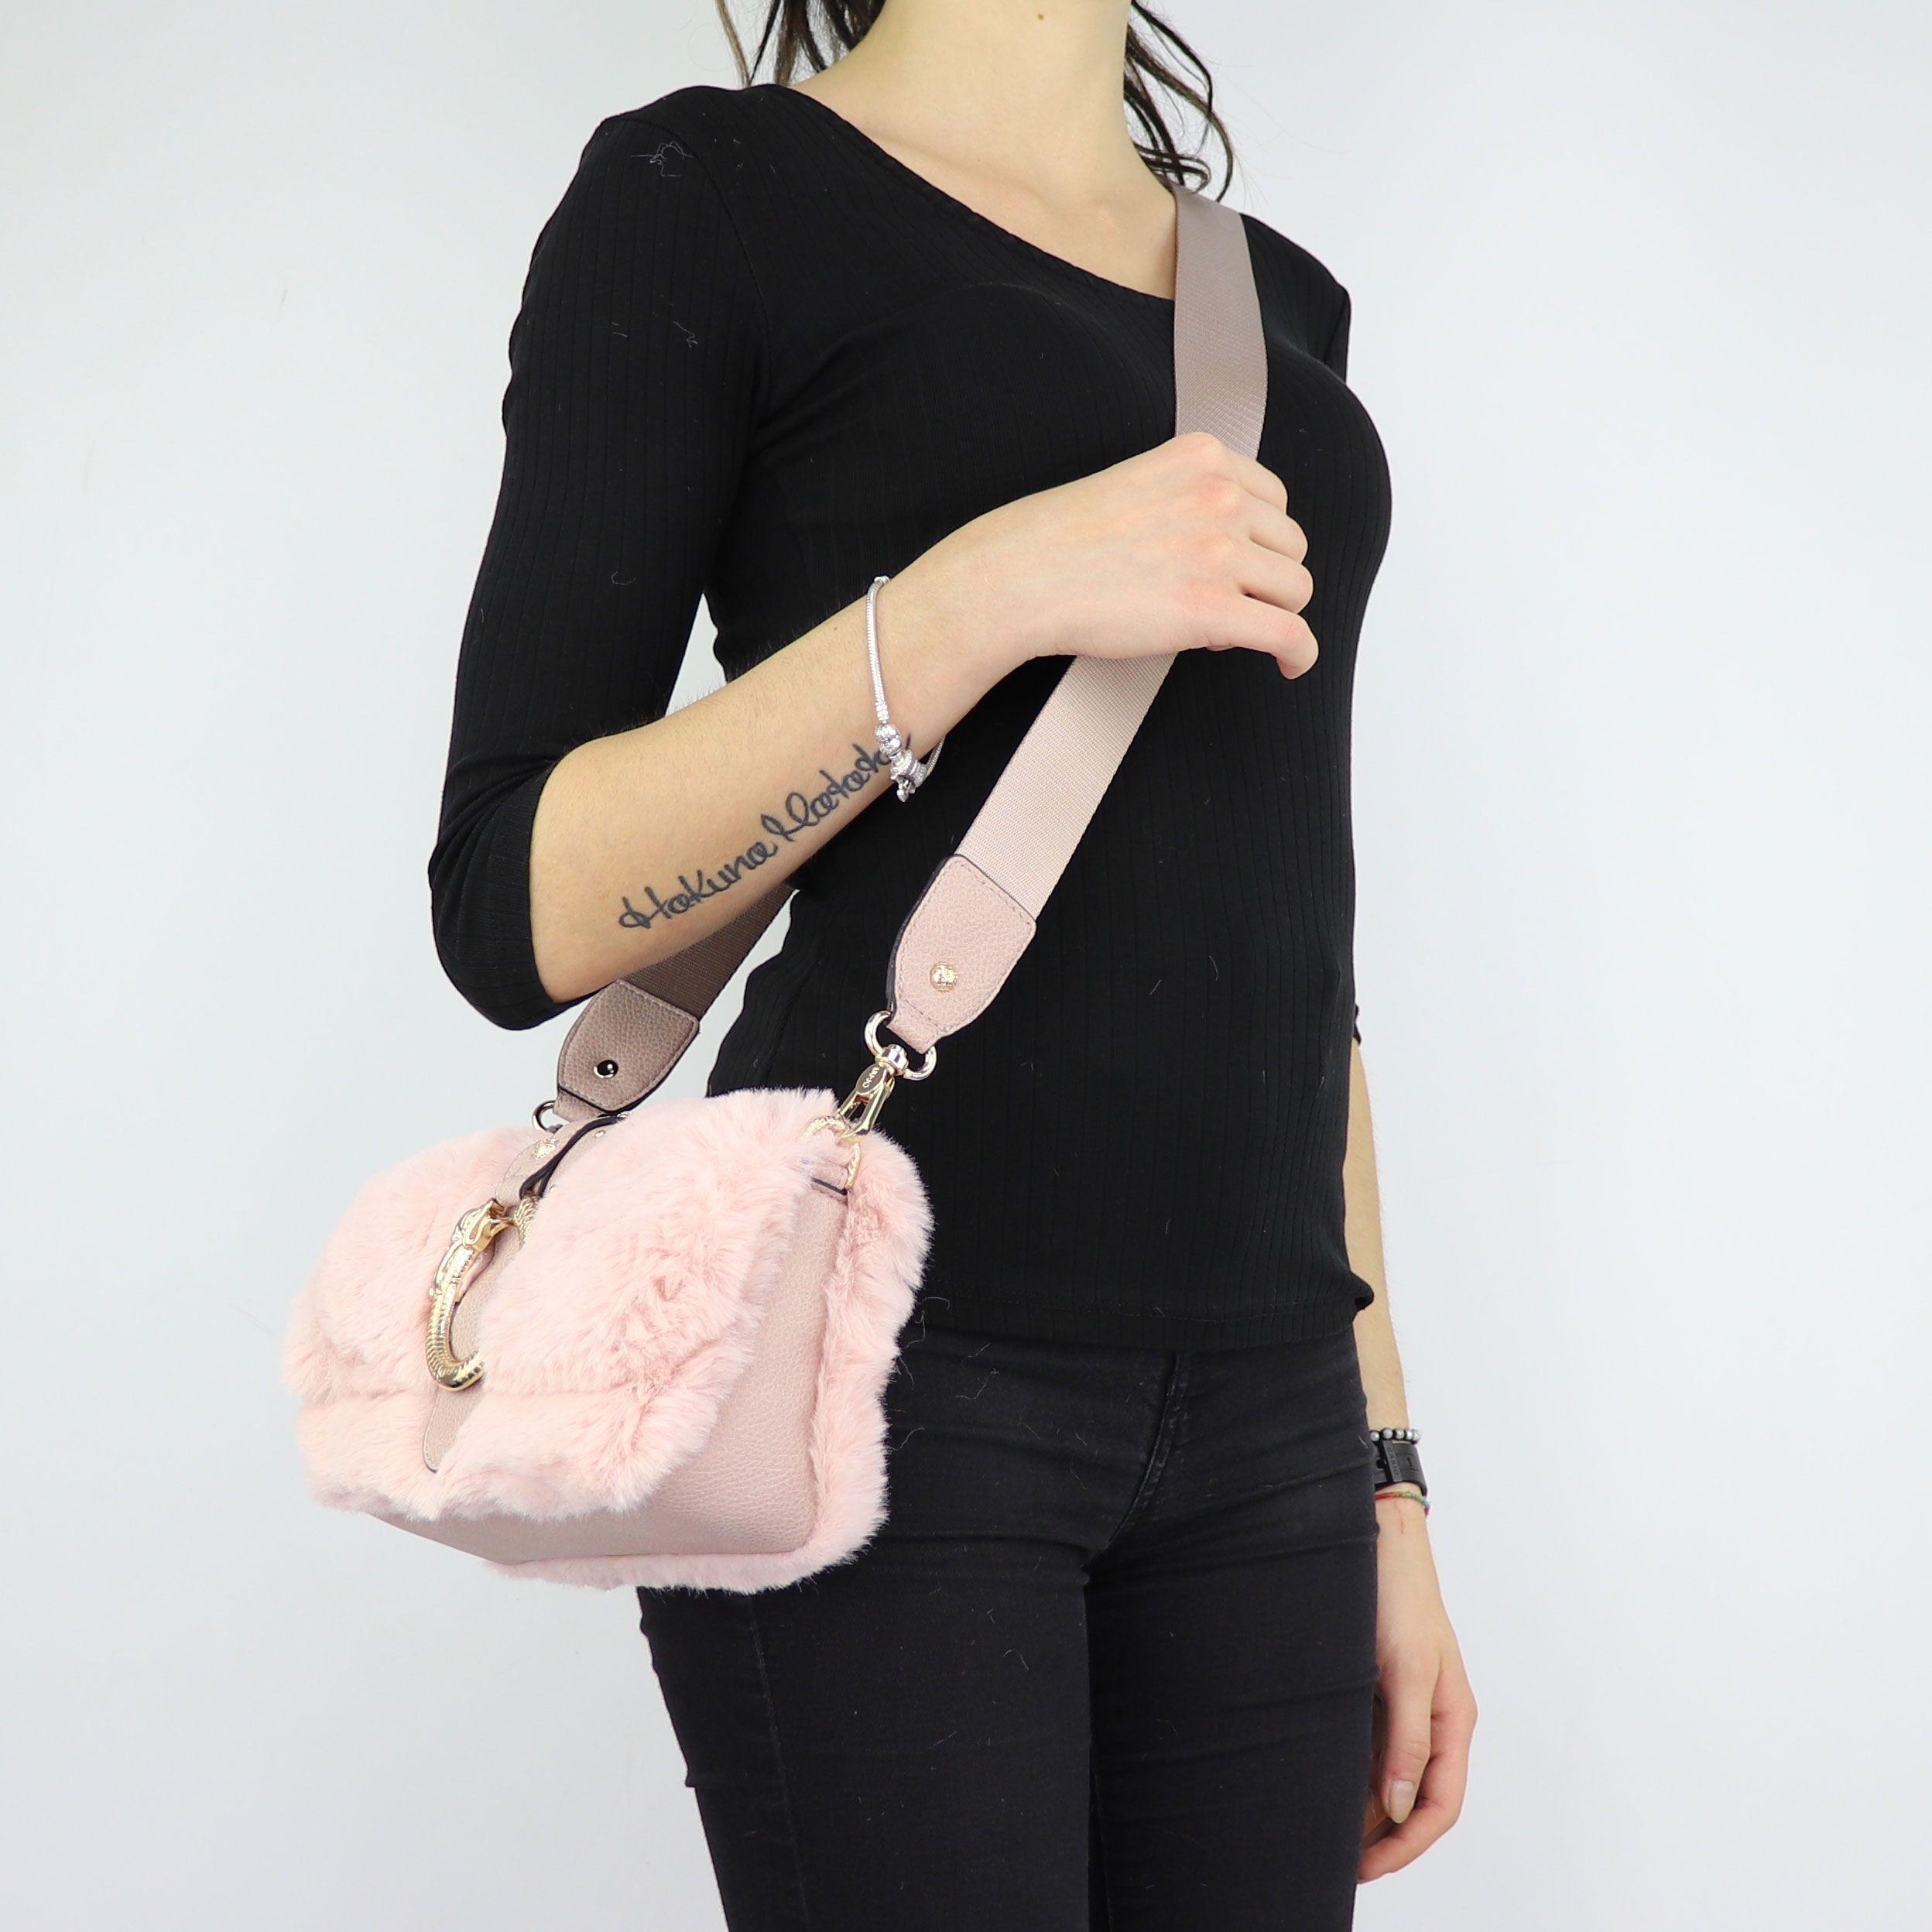 ... Borsa Liu Jo in pelliccetta rosa a tracolla Crossbody Darsena N68040  E0218 ... 3d31497b57c